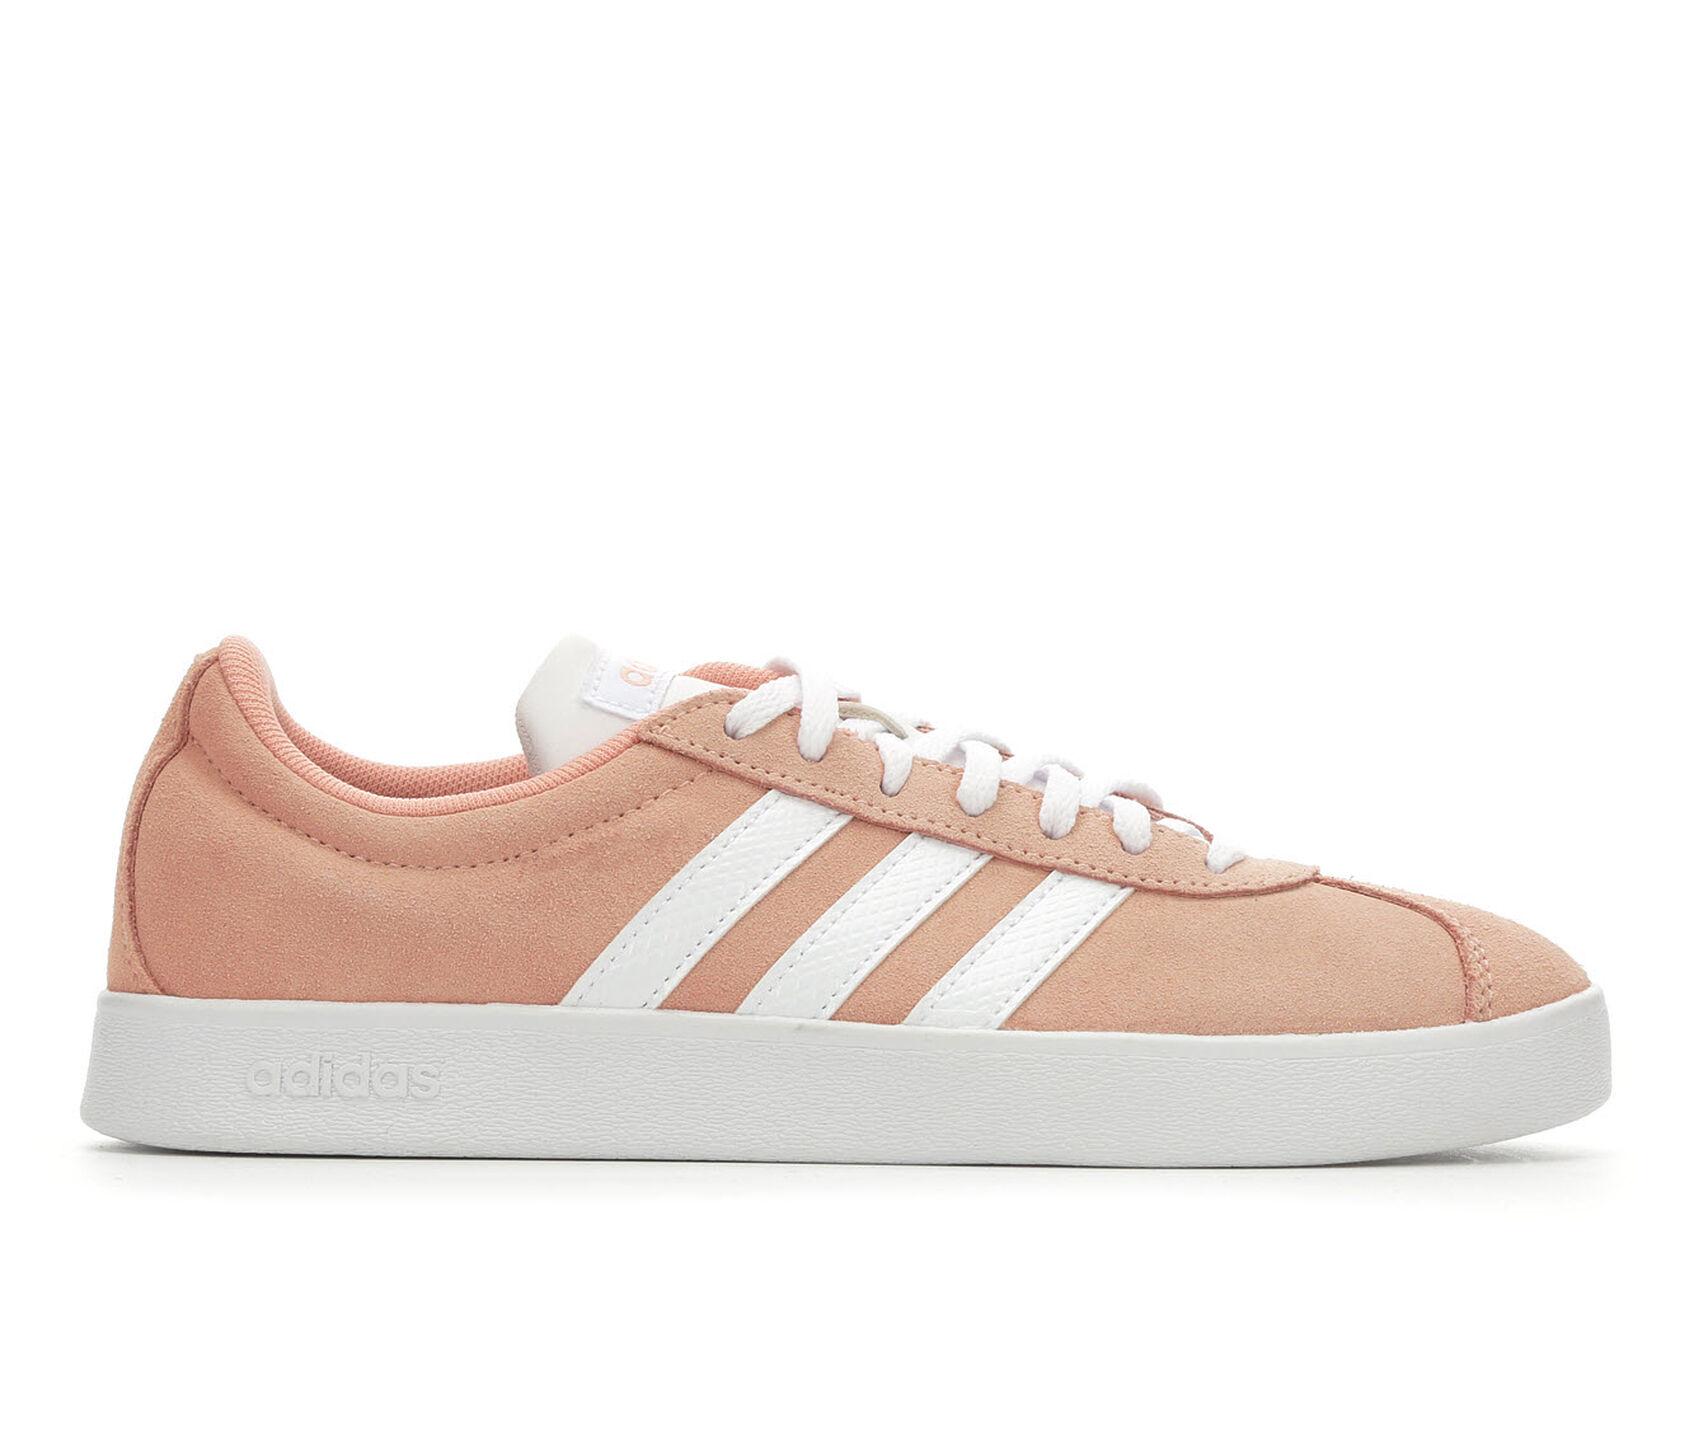 646e175343812 ... Adidas VL Court 2.0 Tennis Shoes. Previous